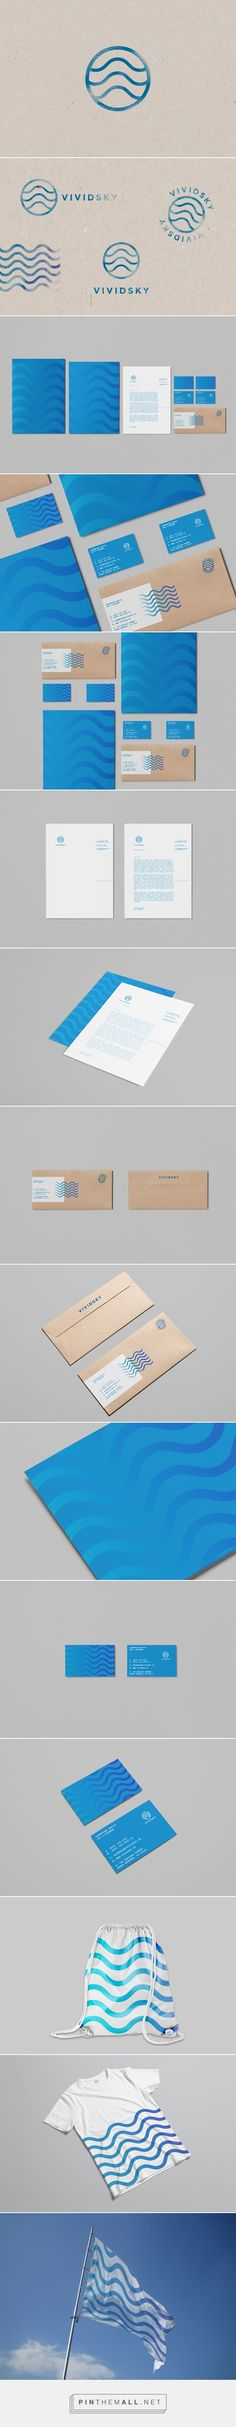 VIVIDSKY on Behance - created via http://pinthemall.net Graphic Design Branding, Brand Identity Design, Advertising Design, Packaging Design, Logo Design, Web Design, Corporate Branding, Corporate Design, Personal Branding